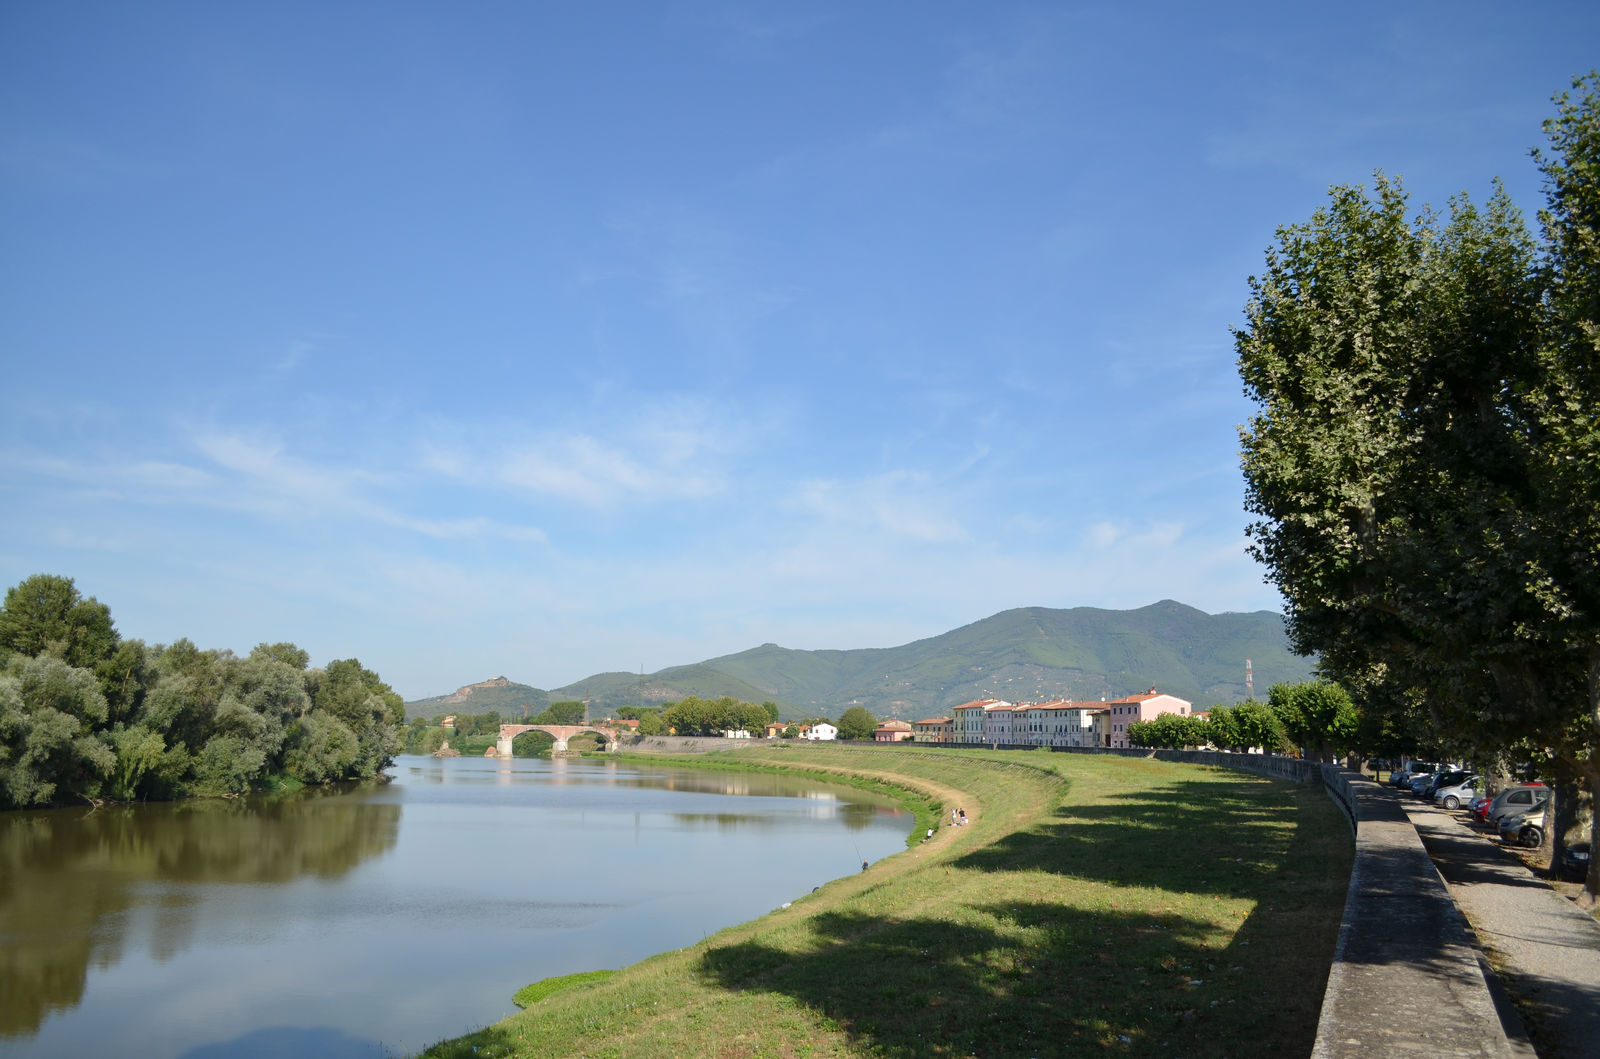 Calcinaia - Calcinaia e i suoi antichi mestieri lungo il fiume Arno - Tuscany, Beautiful Everywhere